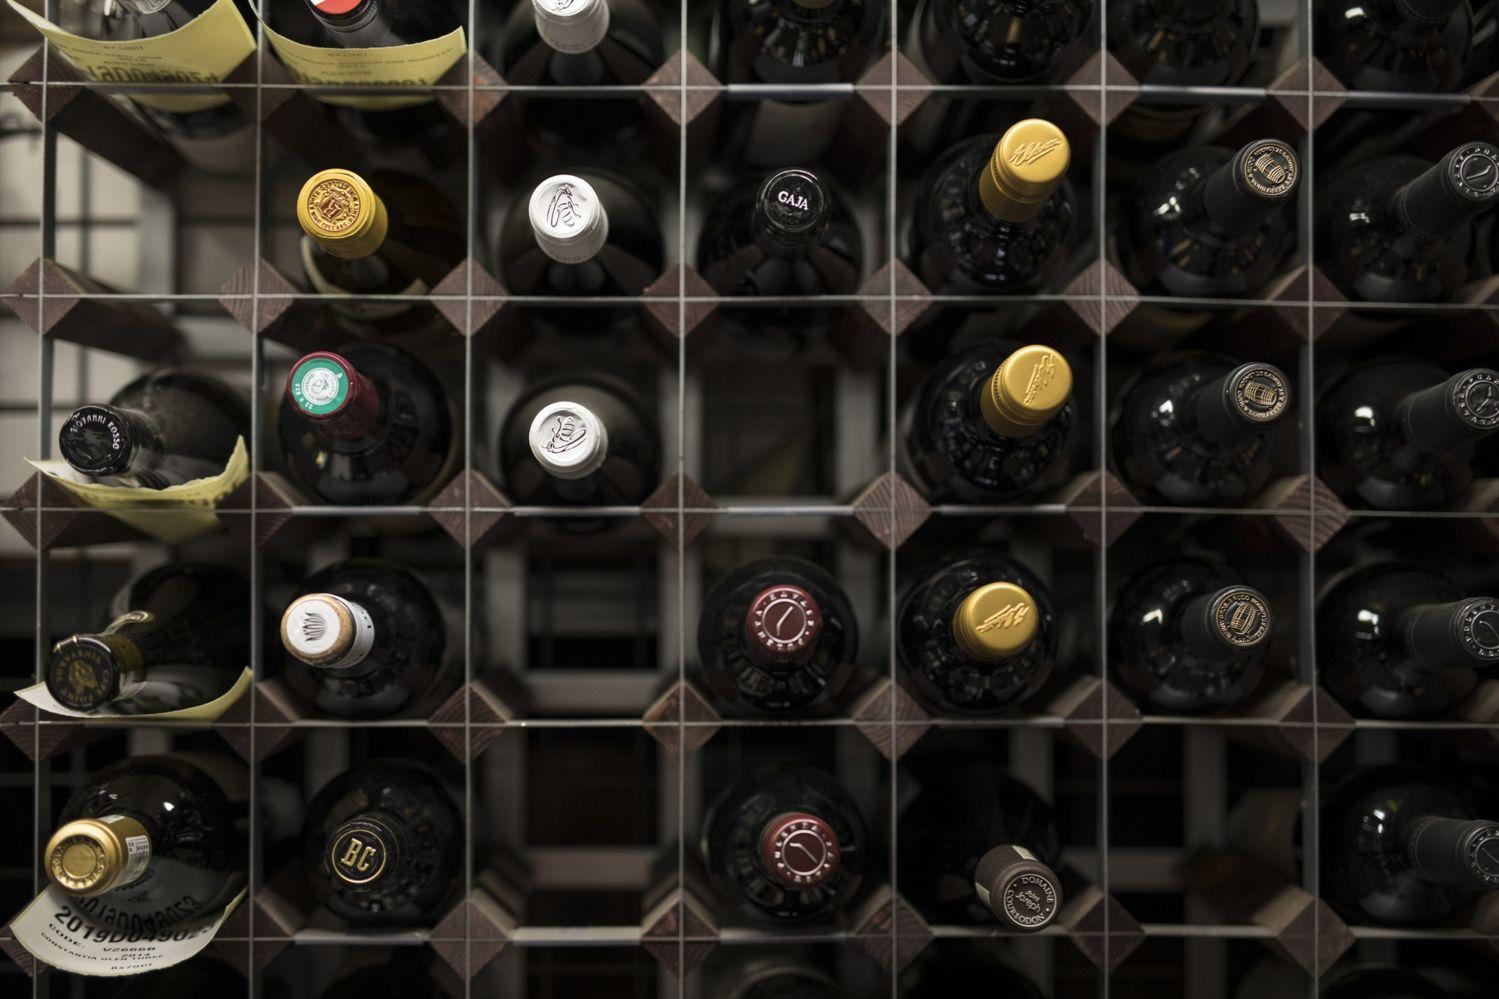 10 Coteaux Champenois wines - THE EDGE SINGAPORE